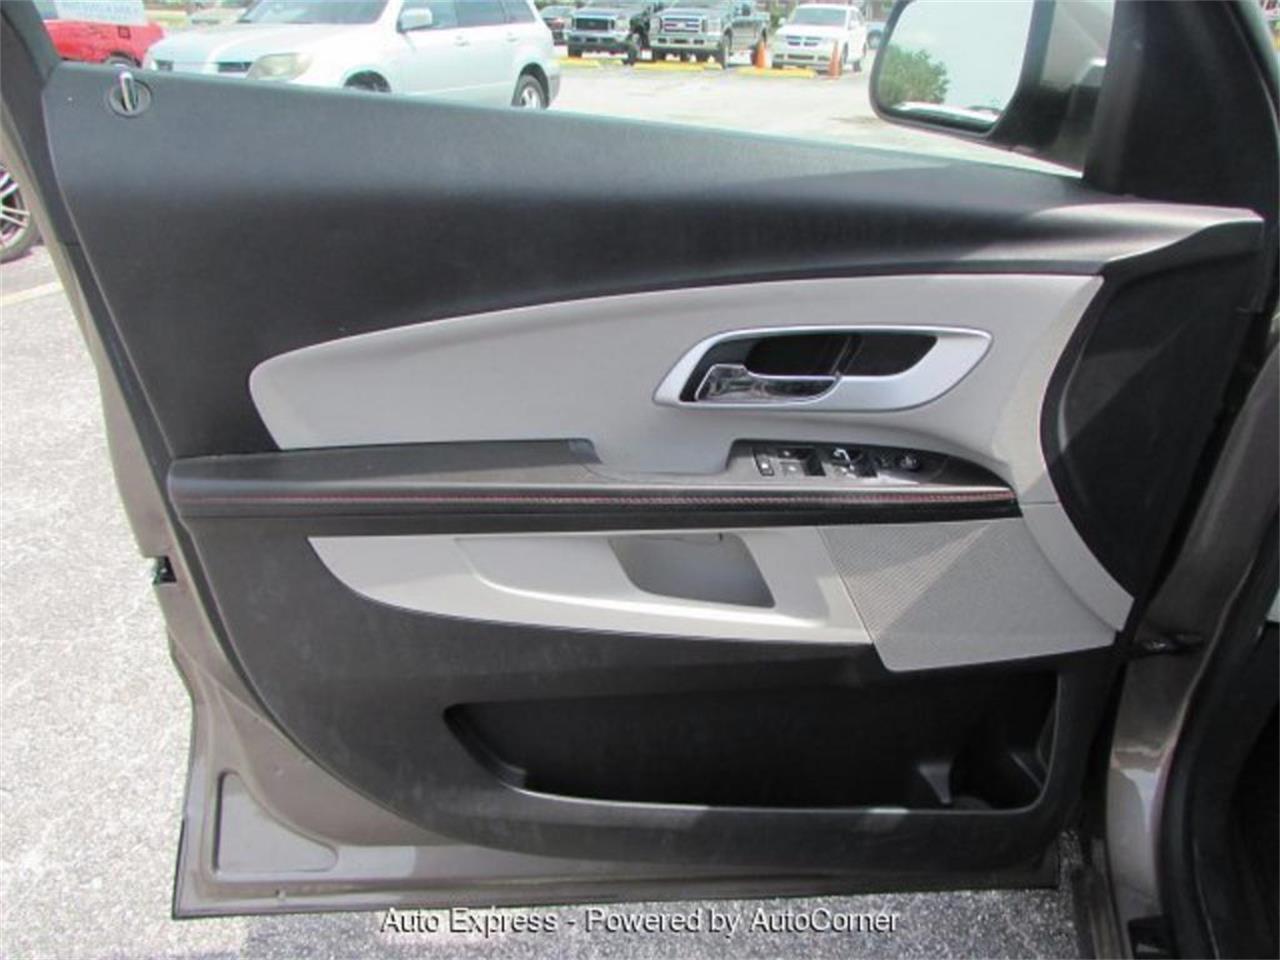 2010 Chevrolet Equinox (CC-1216011) for sale in Orlando, Florida